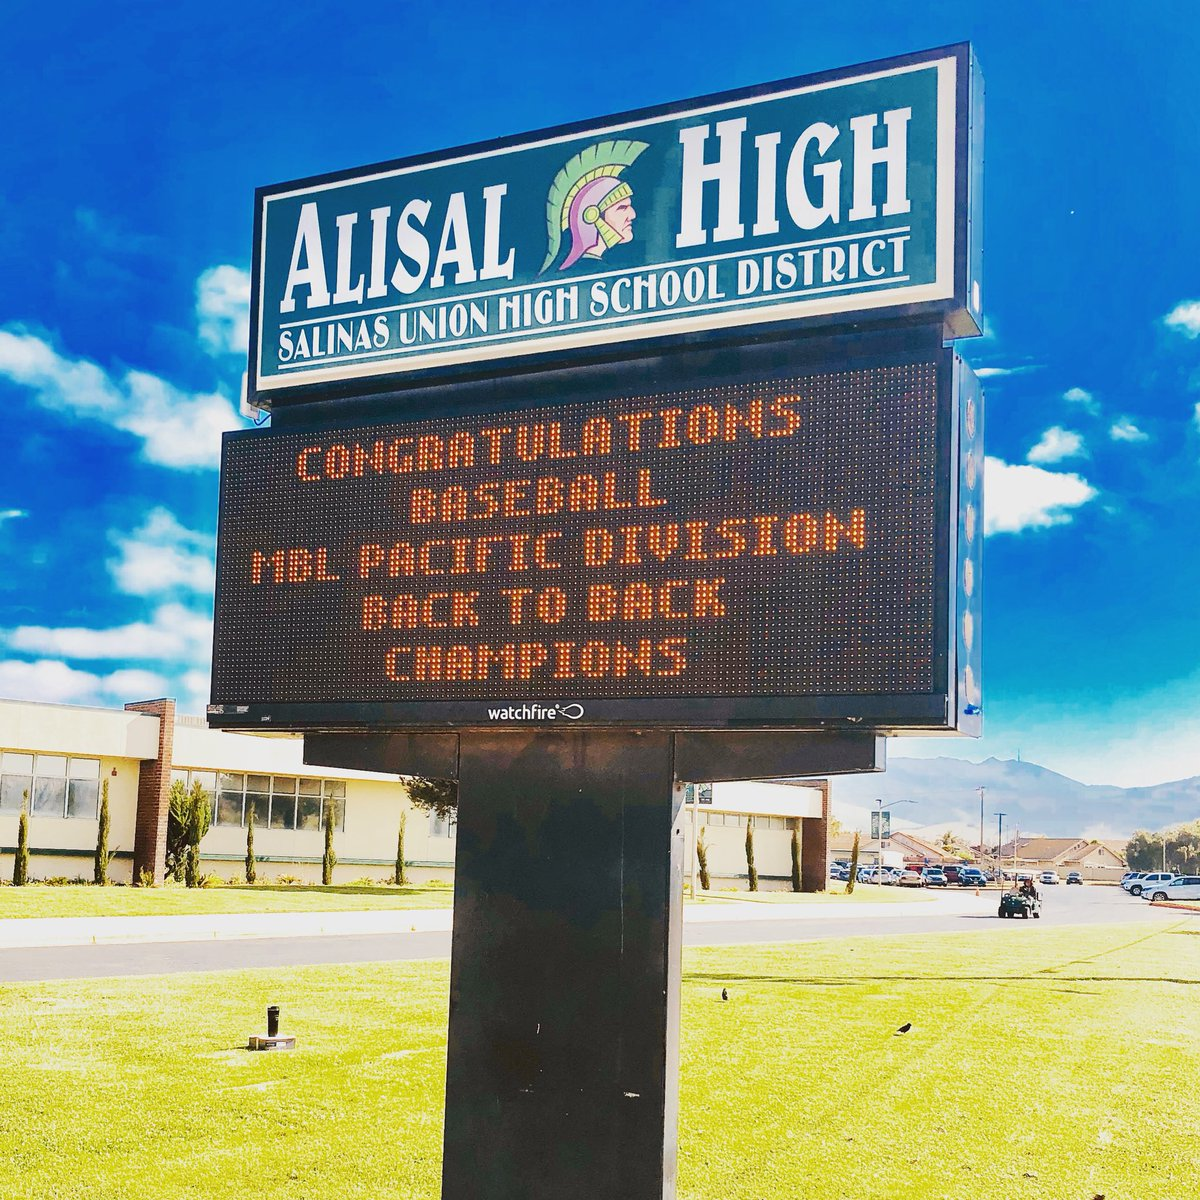 salinas union high school district